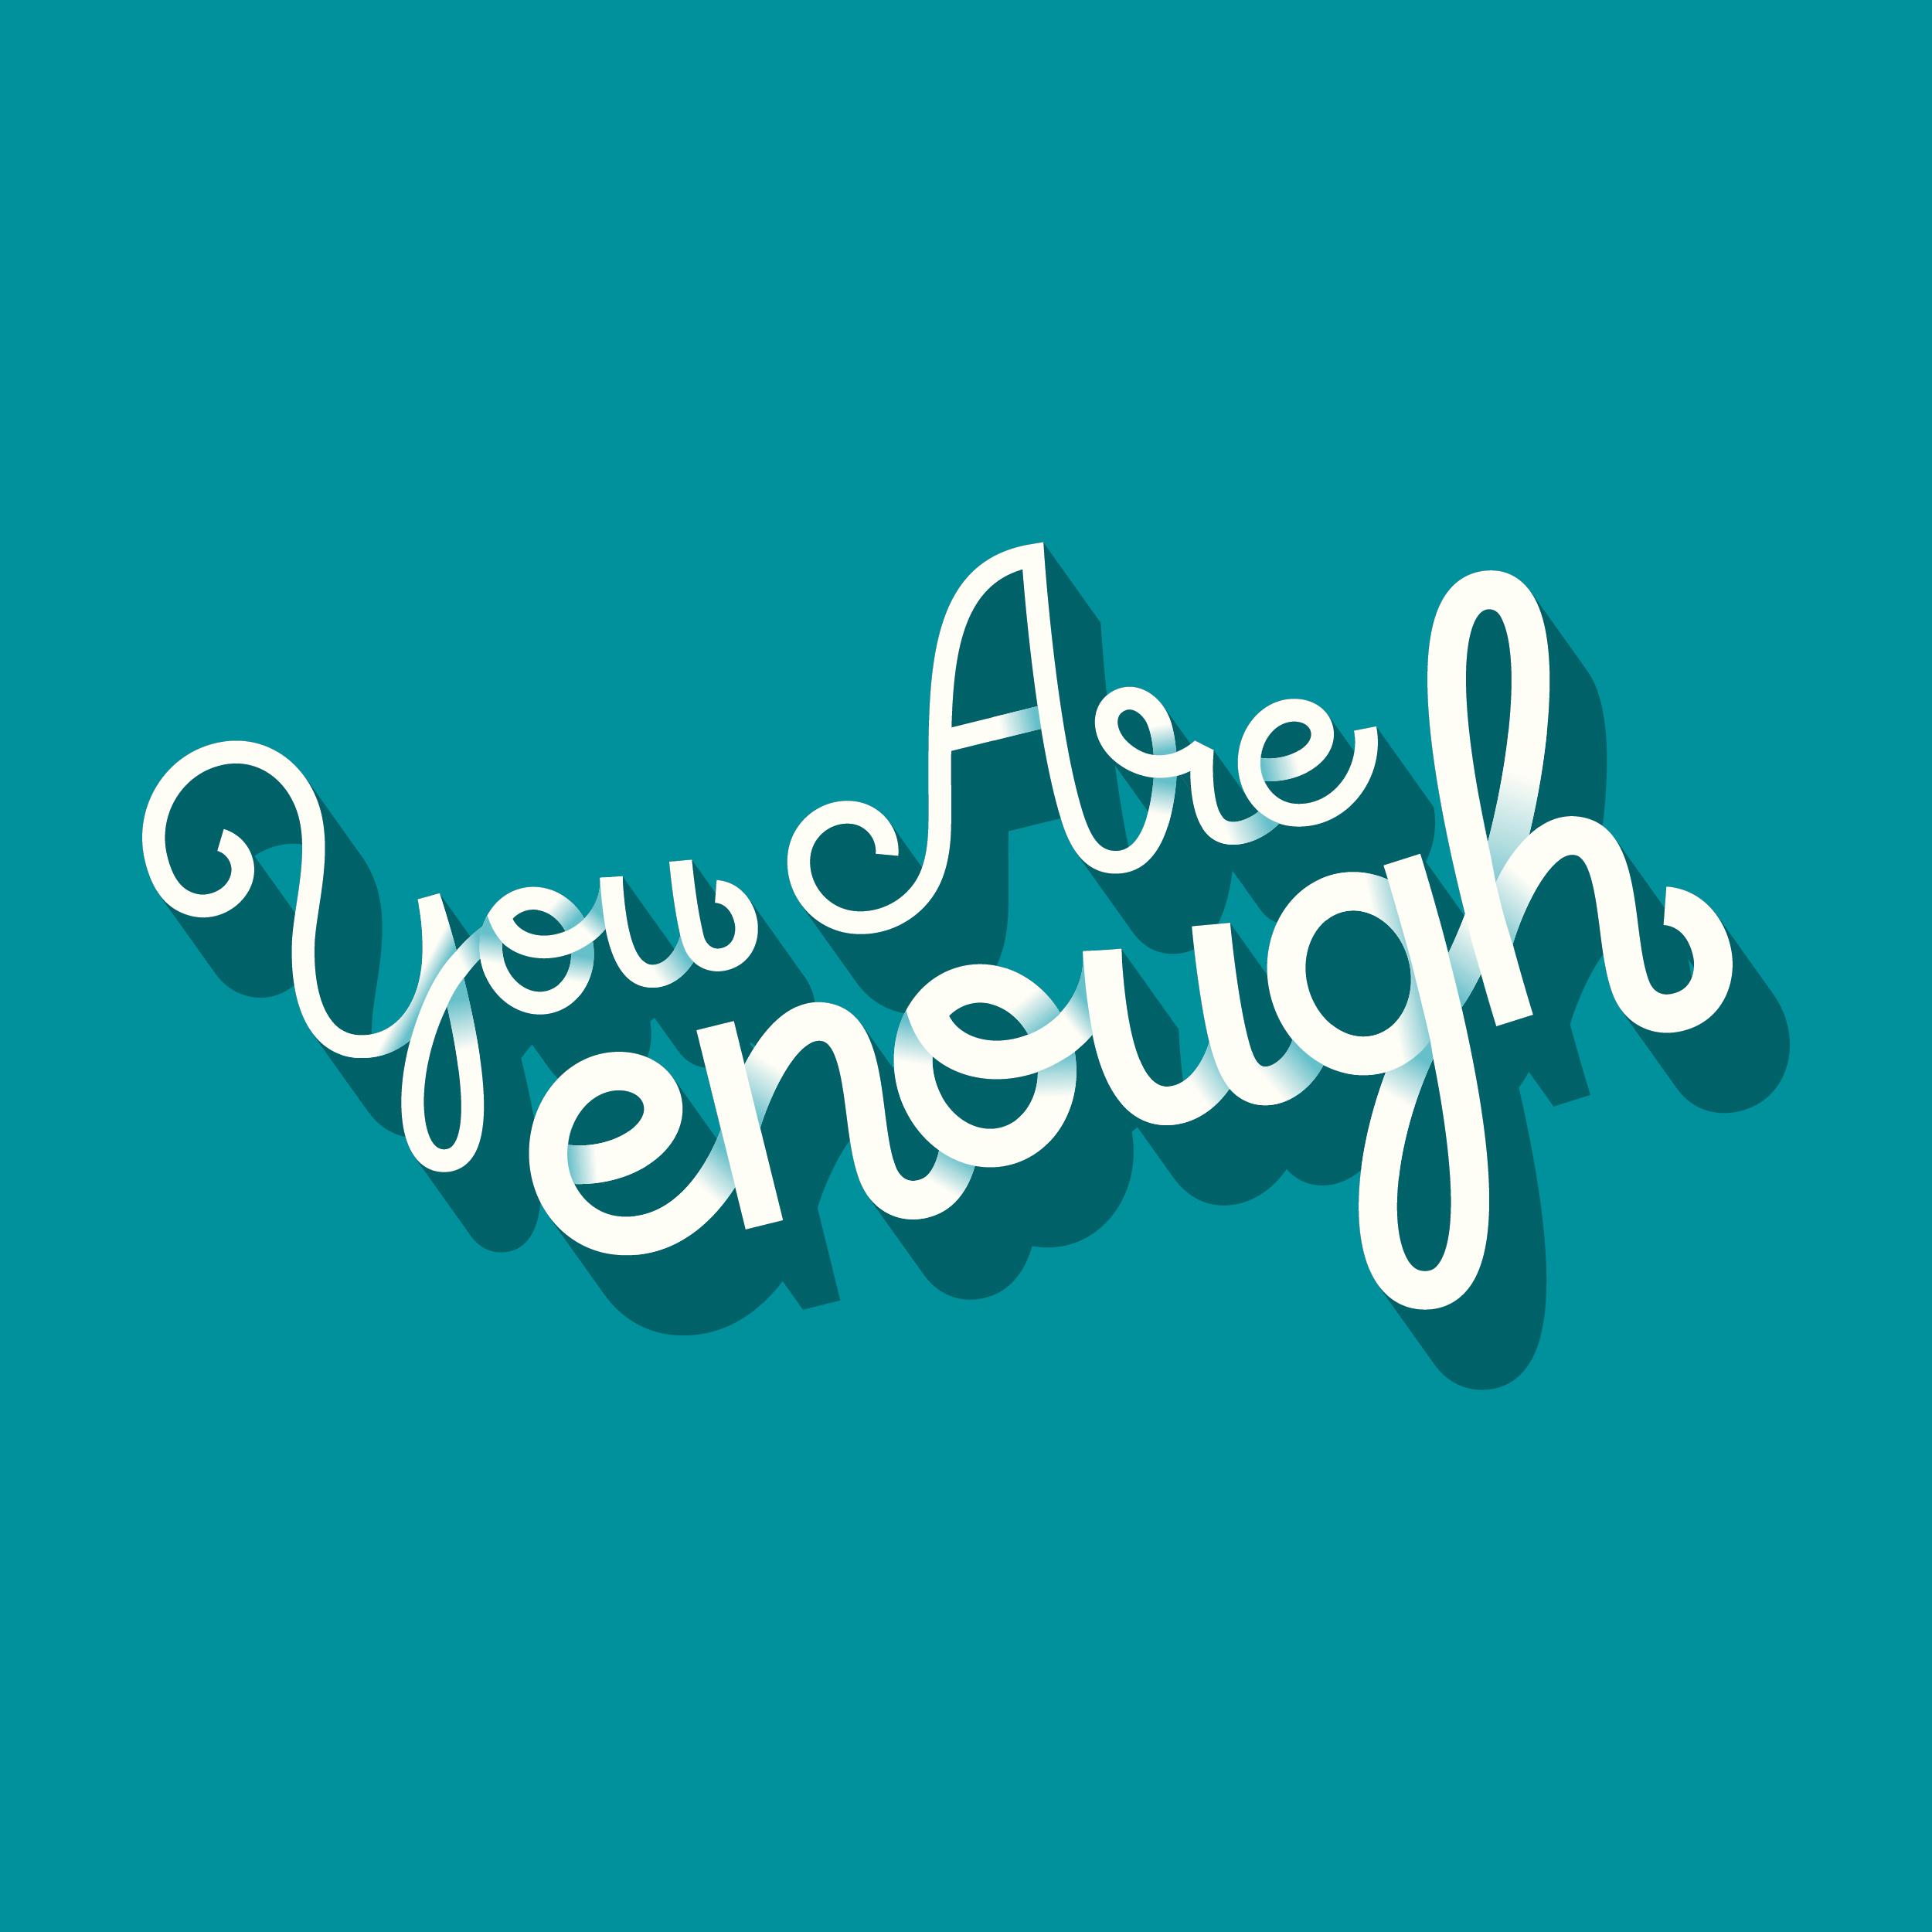 YouAreEnough-01.jpg